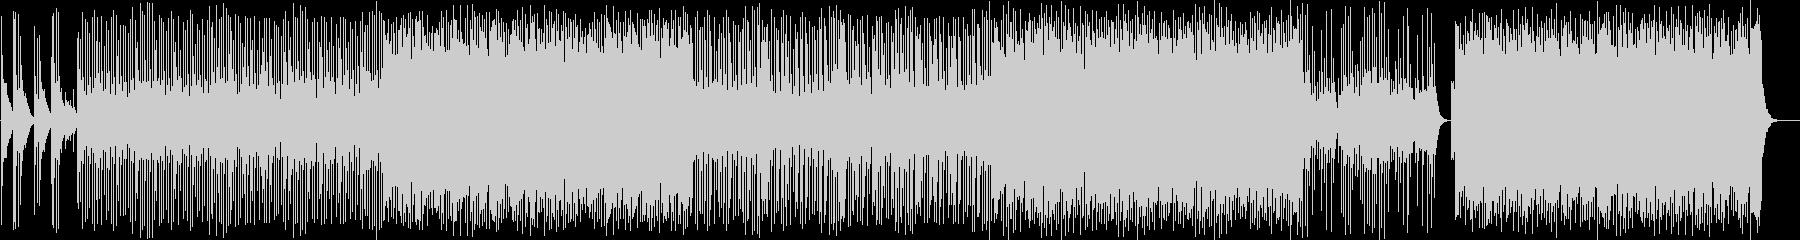 和風/和楽器(三味線・琴・太鼓)/B3の未再生の波形